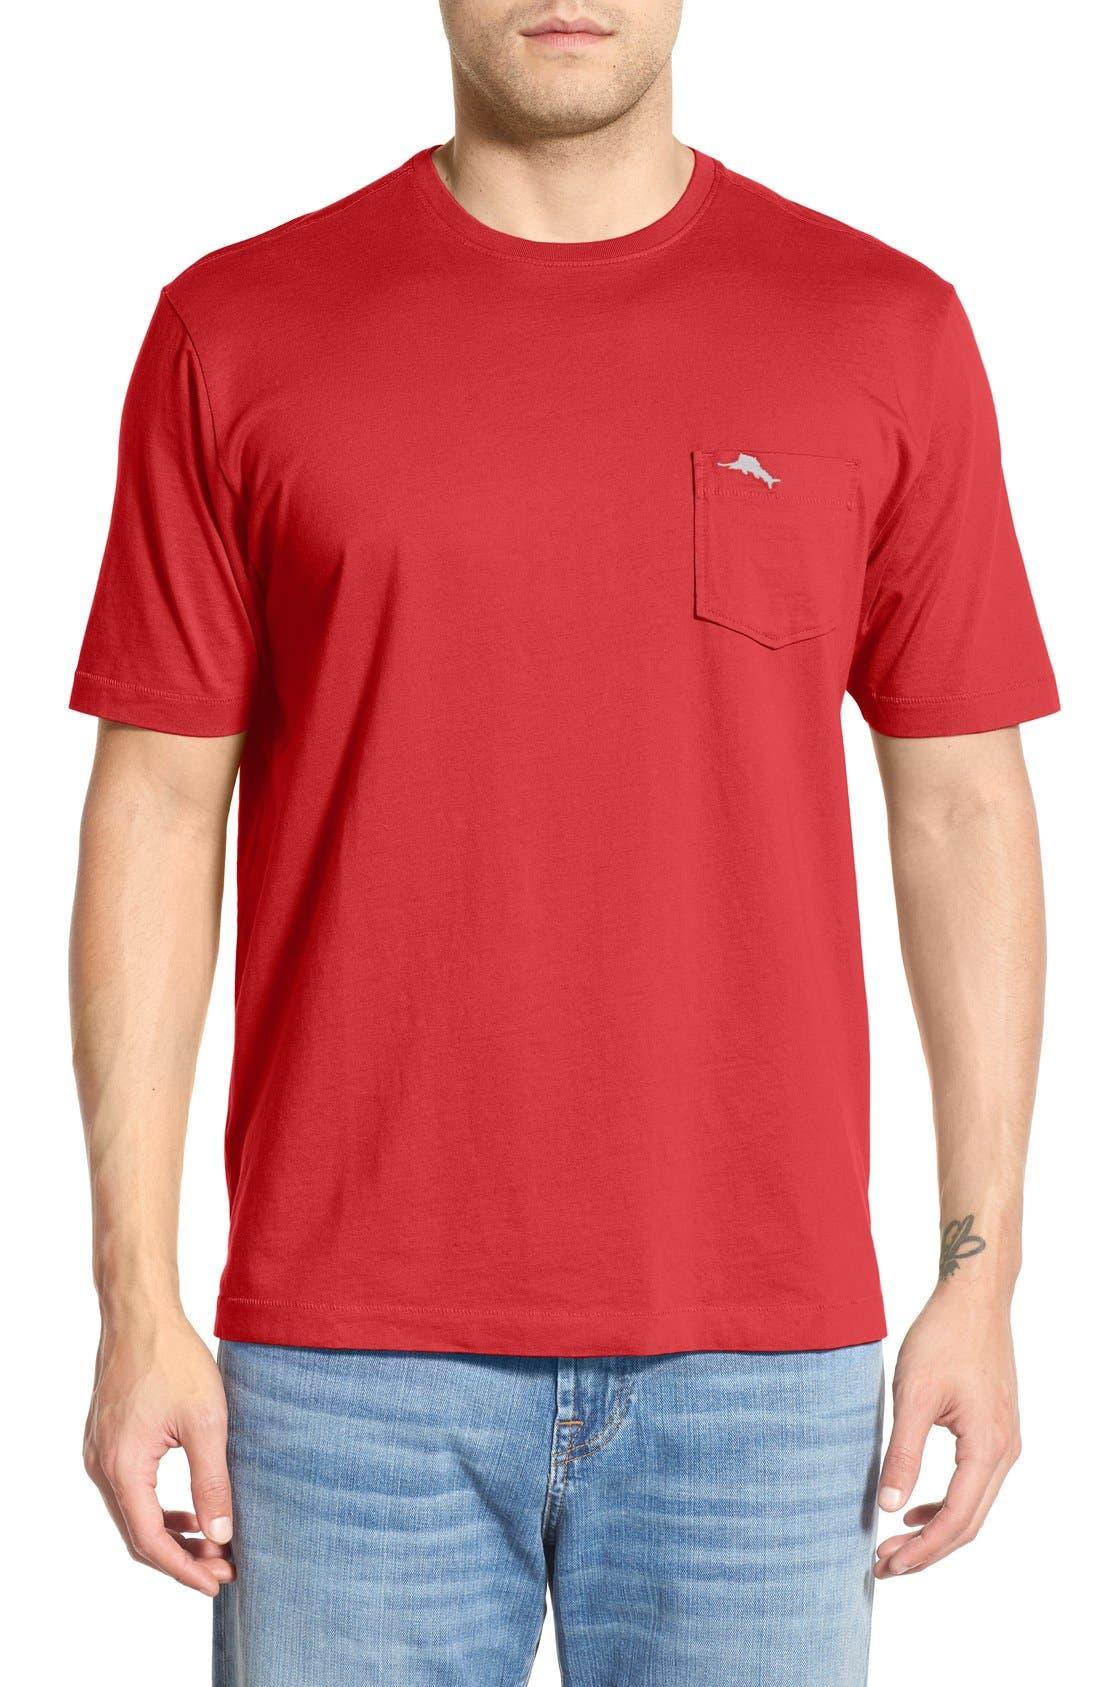 'New Bali Sky' Original Fit Crewneck Pocket T-Shirt,                             Main thumbnail 1, color,                             Red Cherry